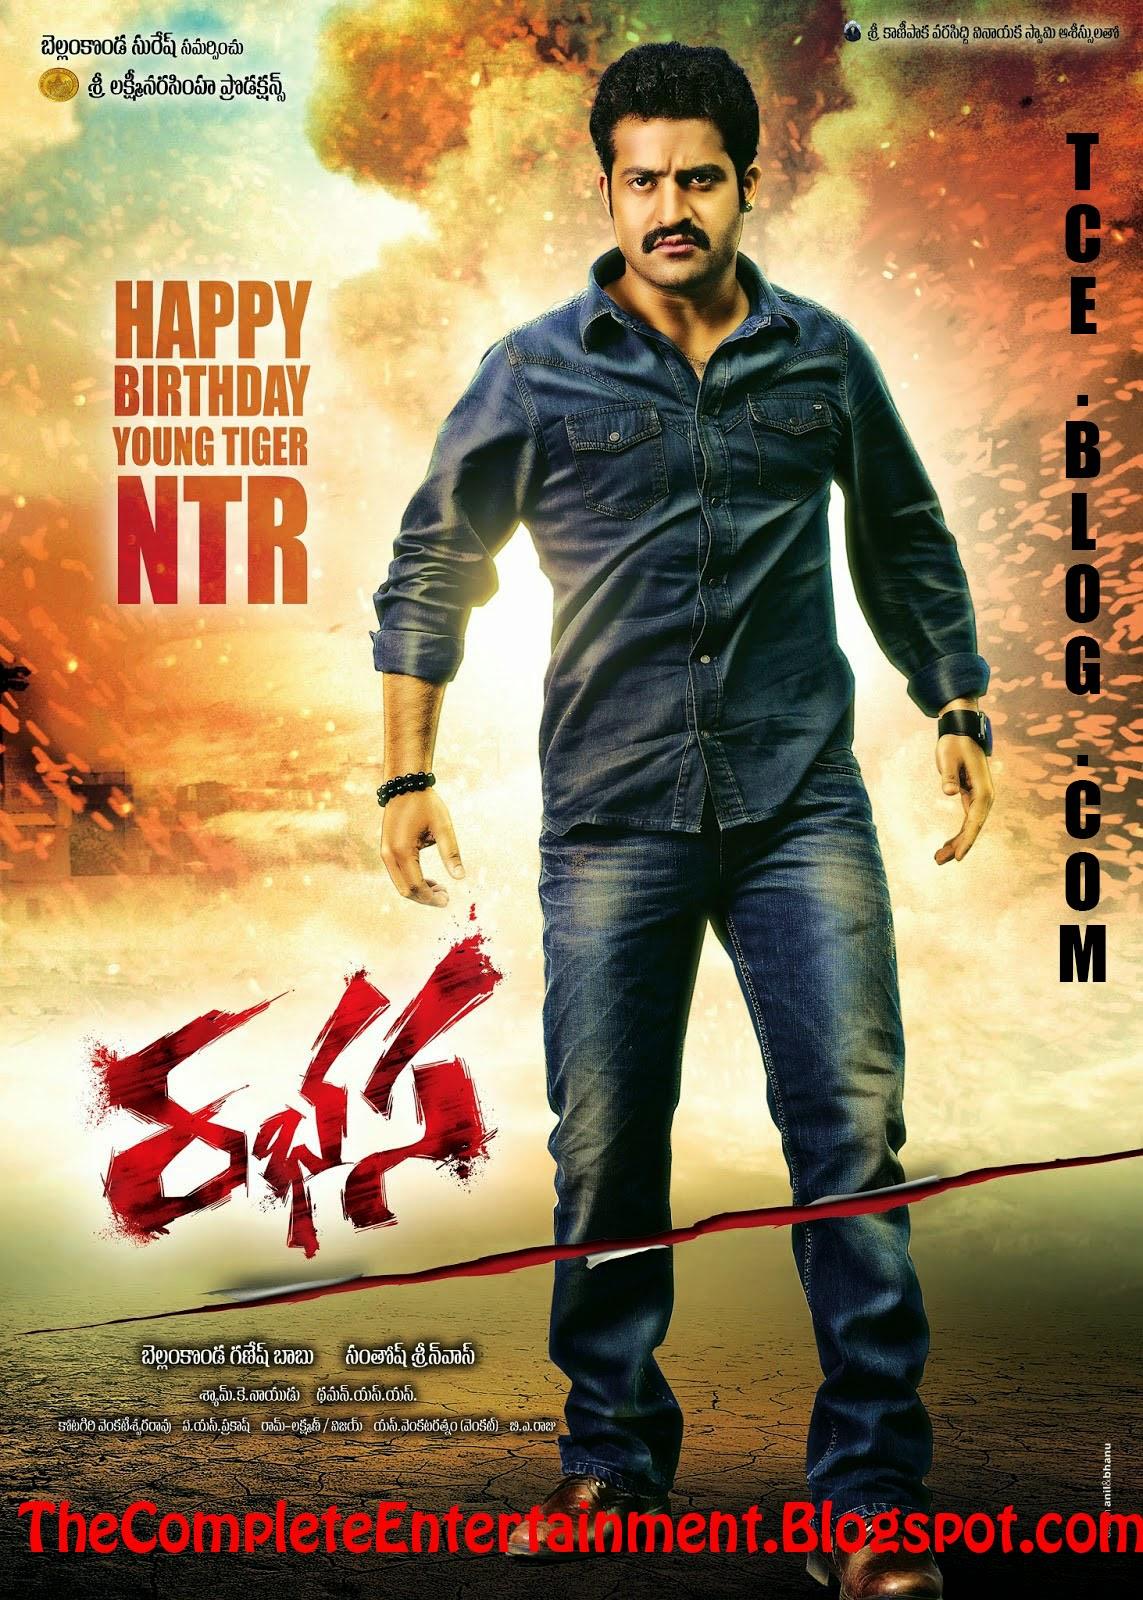 Rabhasa Telugu Movie Review, Torrent File Download And Watch Full Movie